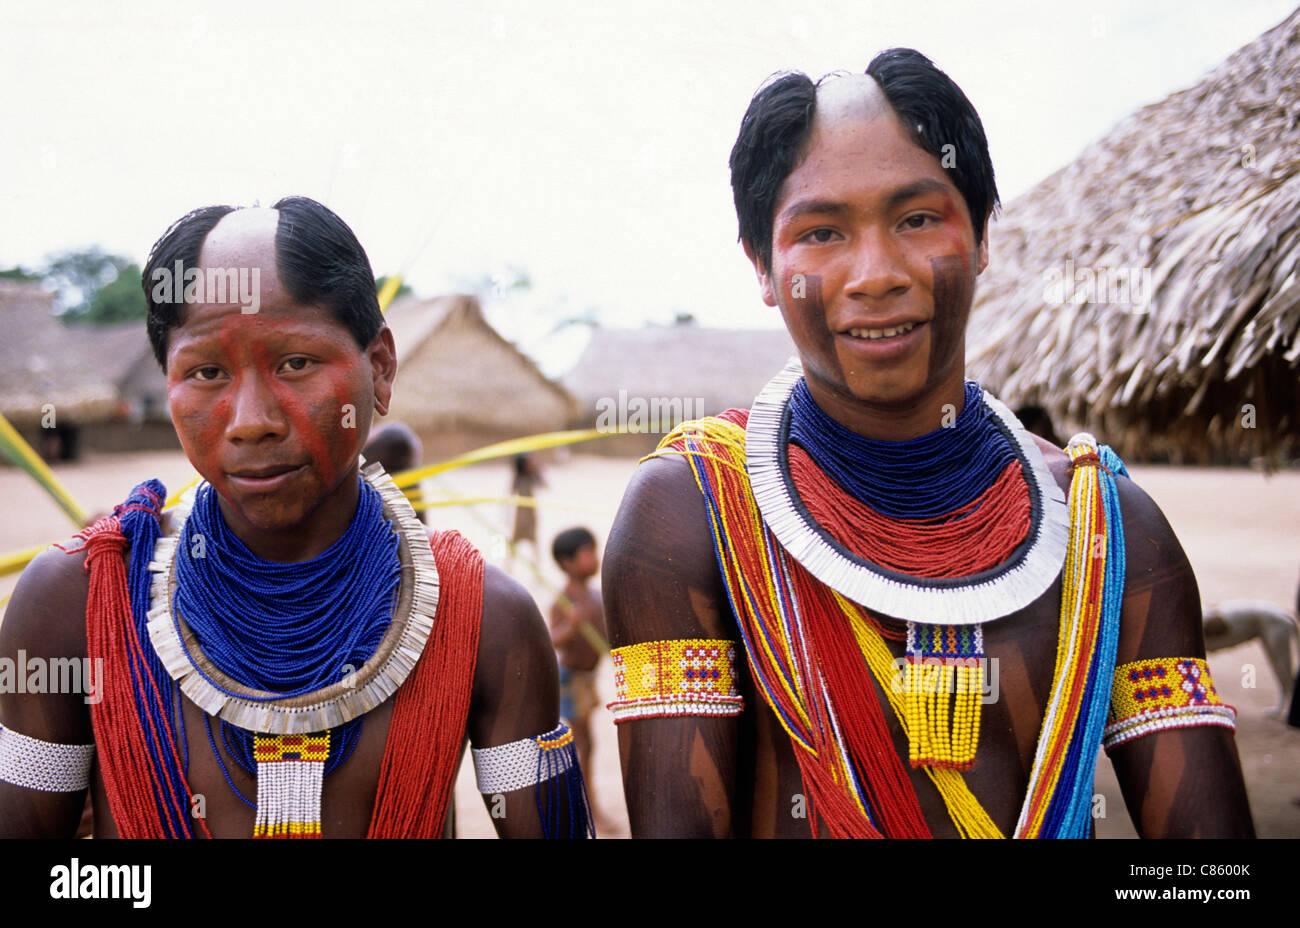 VISUAL JUNKEE - KAYAPO COURAGE: The Amazon tribe has